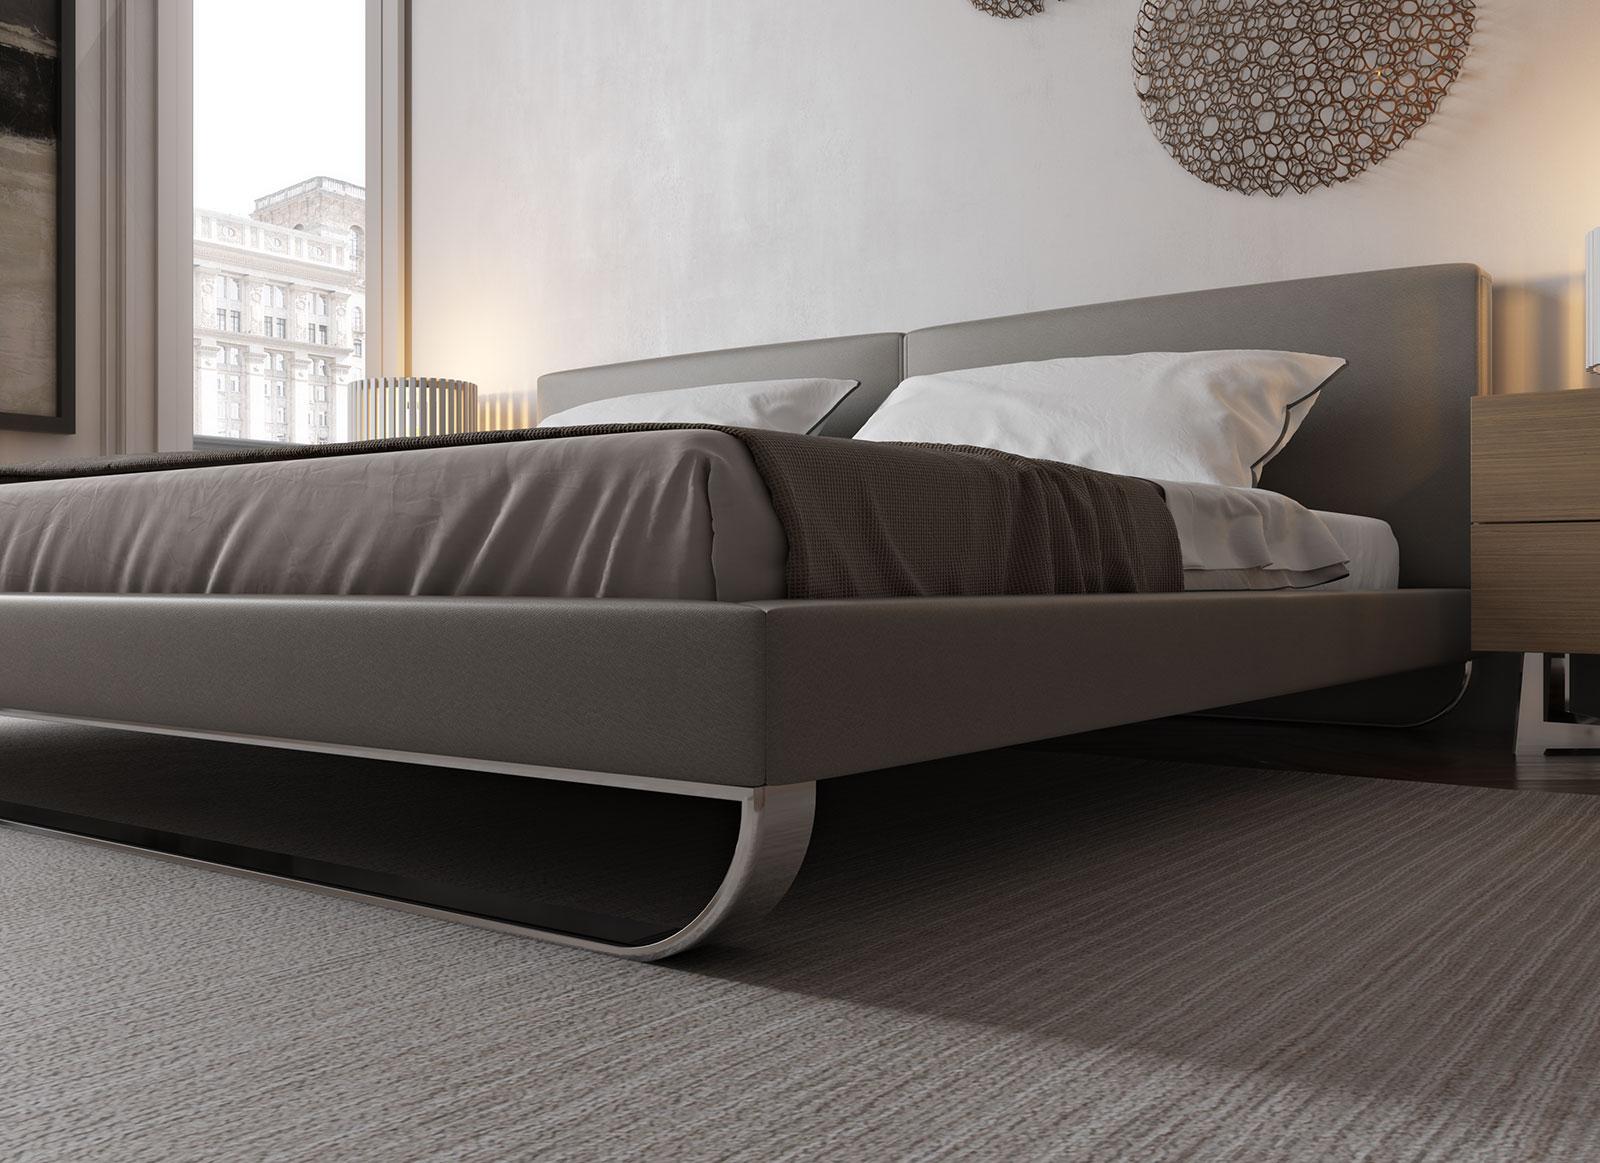 Overnice Leather Luxury Platform Bed Albuquerque New